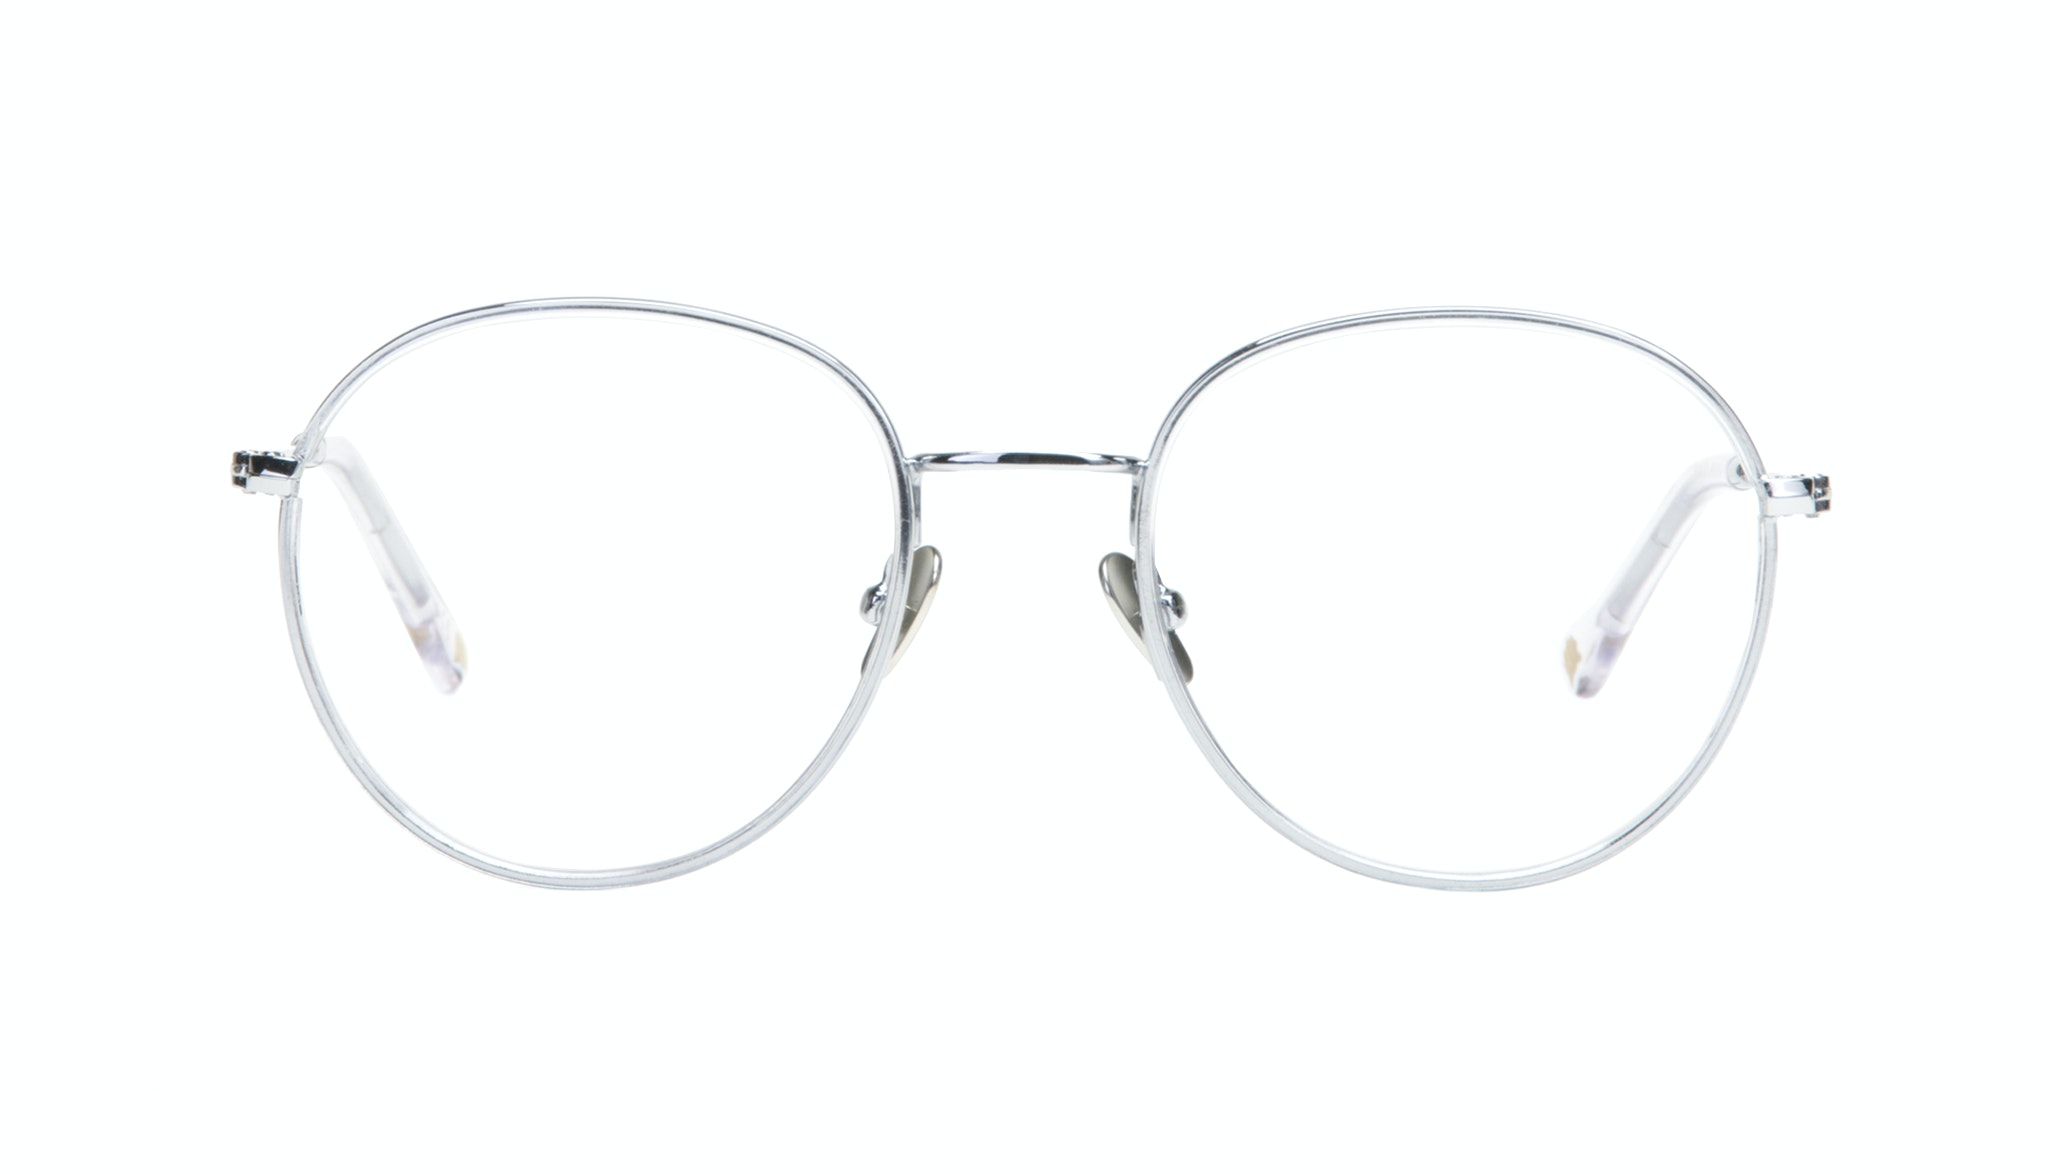 Affordable Fashion Glasses Aviator Round Eyeglasses Women Subrosa Glacier